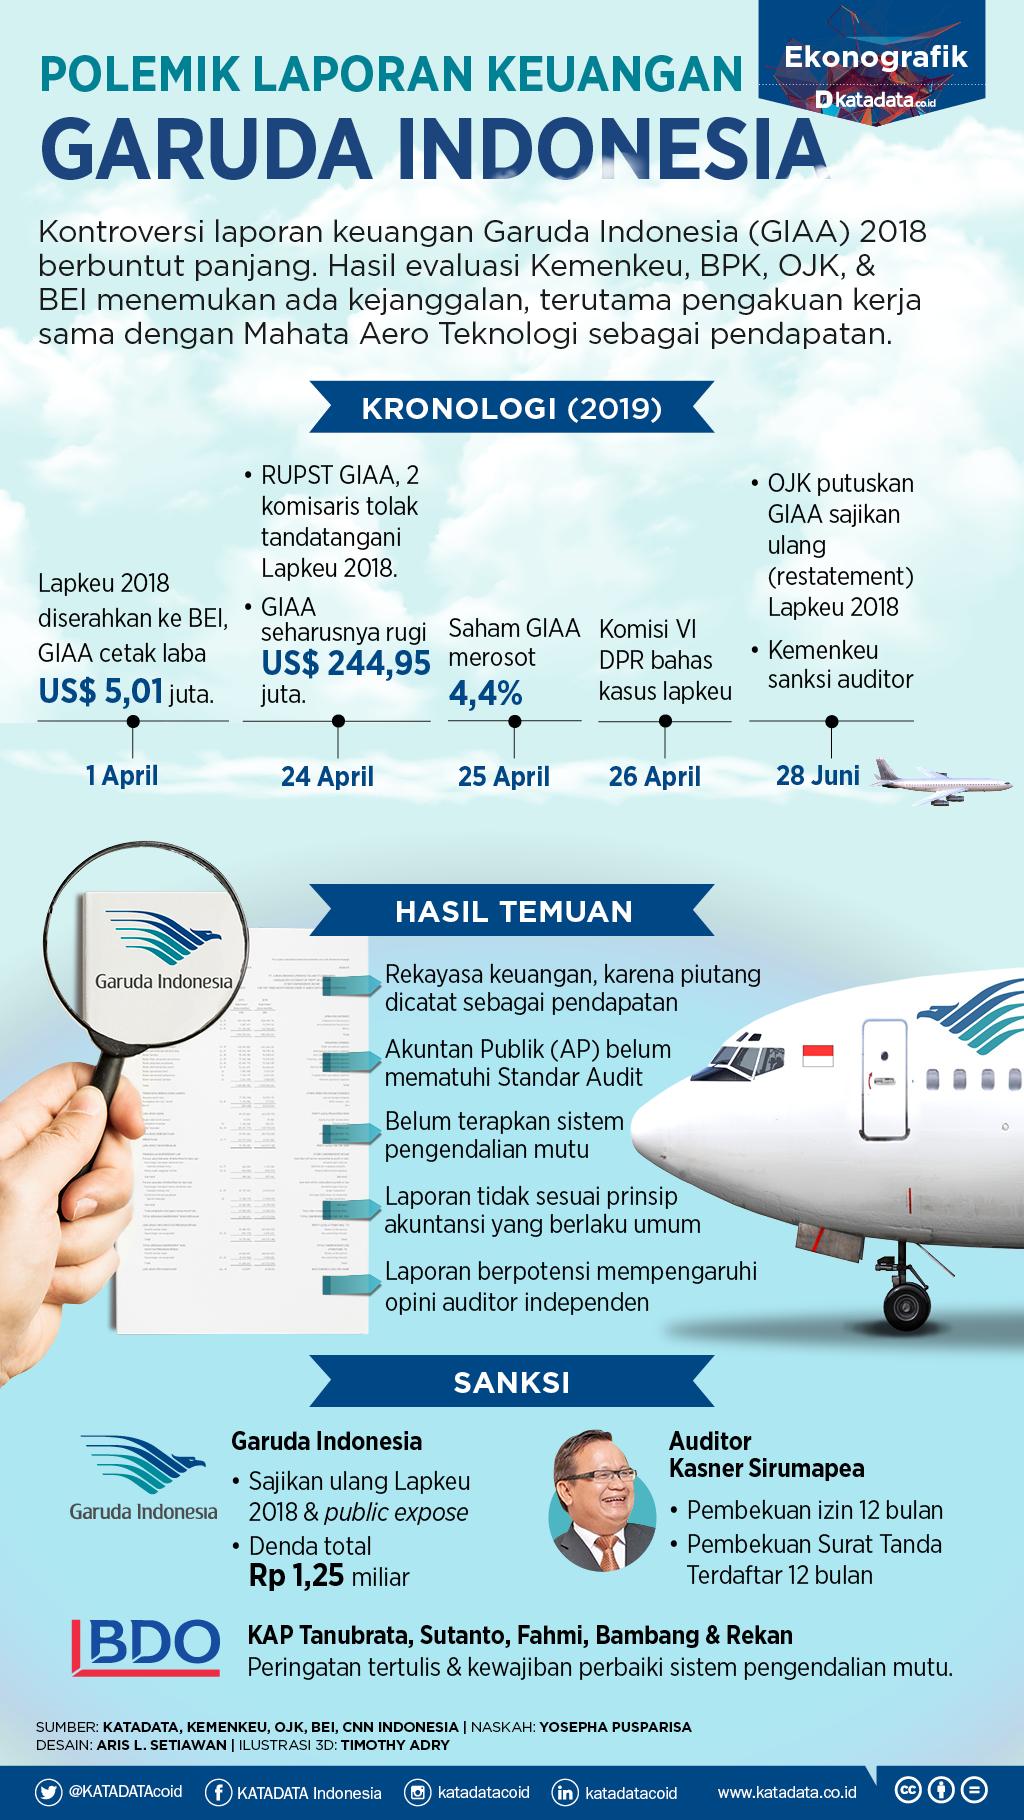 Laporan Keuangan Garuda